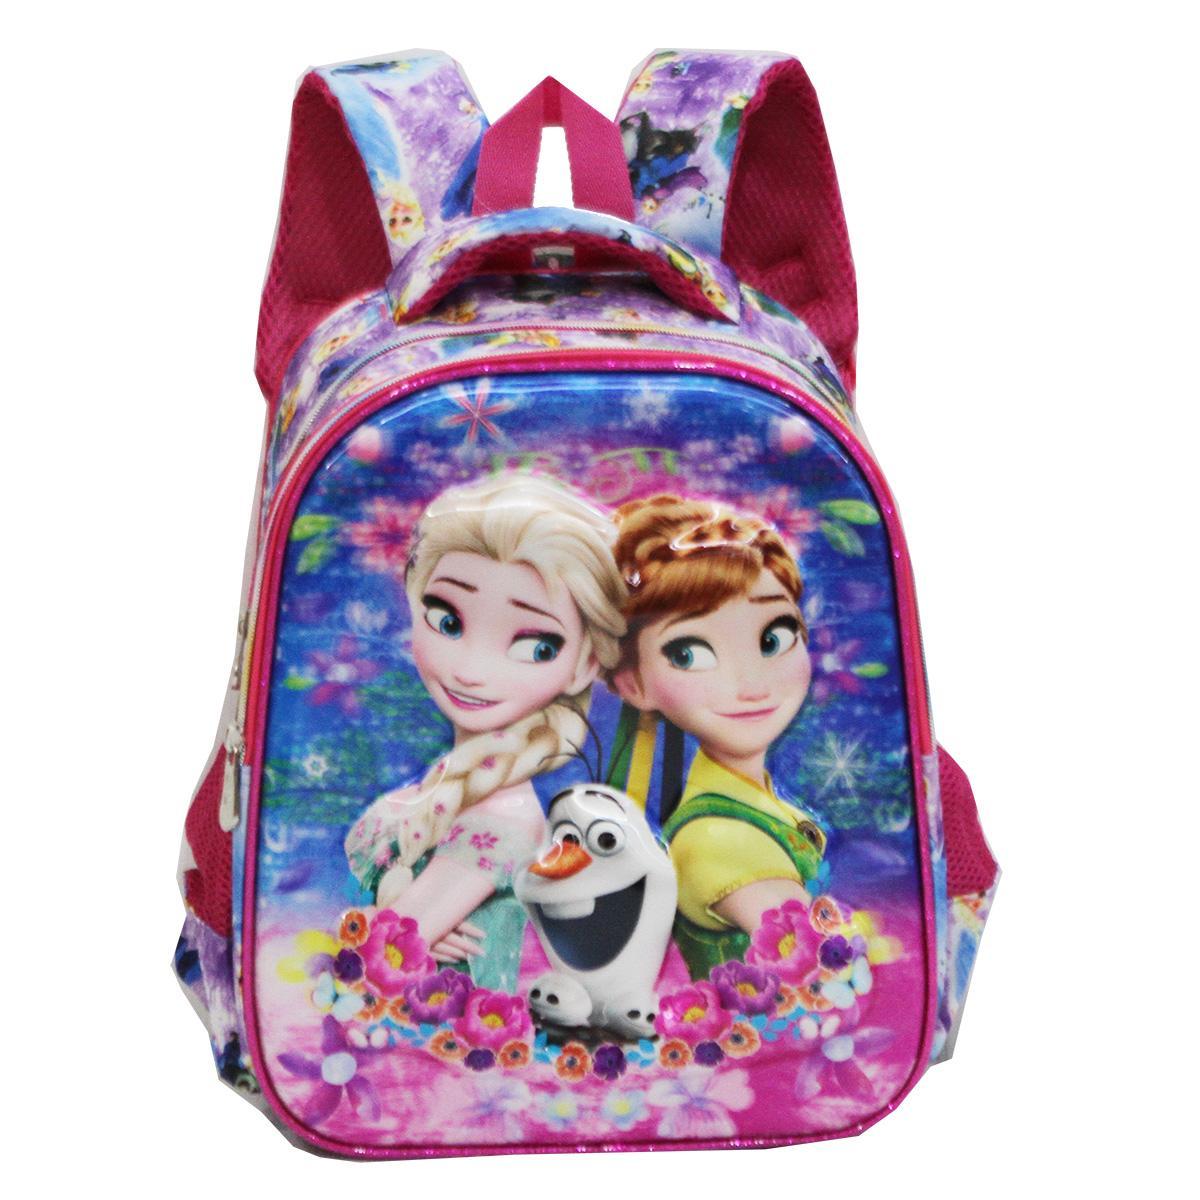 ... Onlan Tas Ransel Anak Perempuan Frozen 5D Timbul Hologram Ukuran Anak Sekolah TK Import - Pink ...